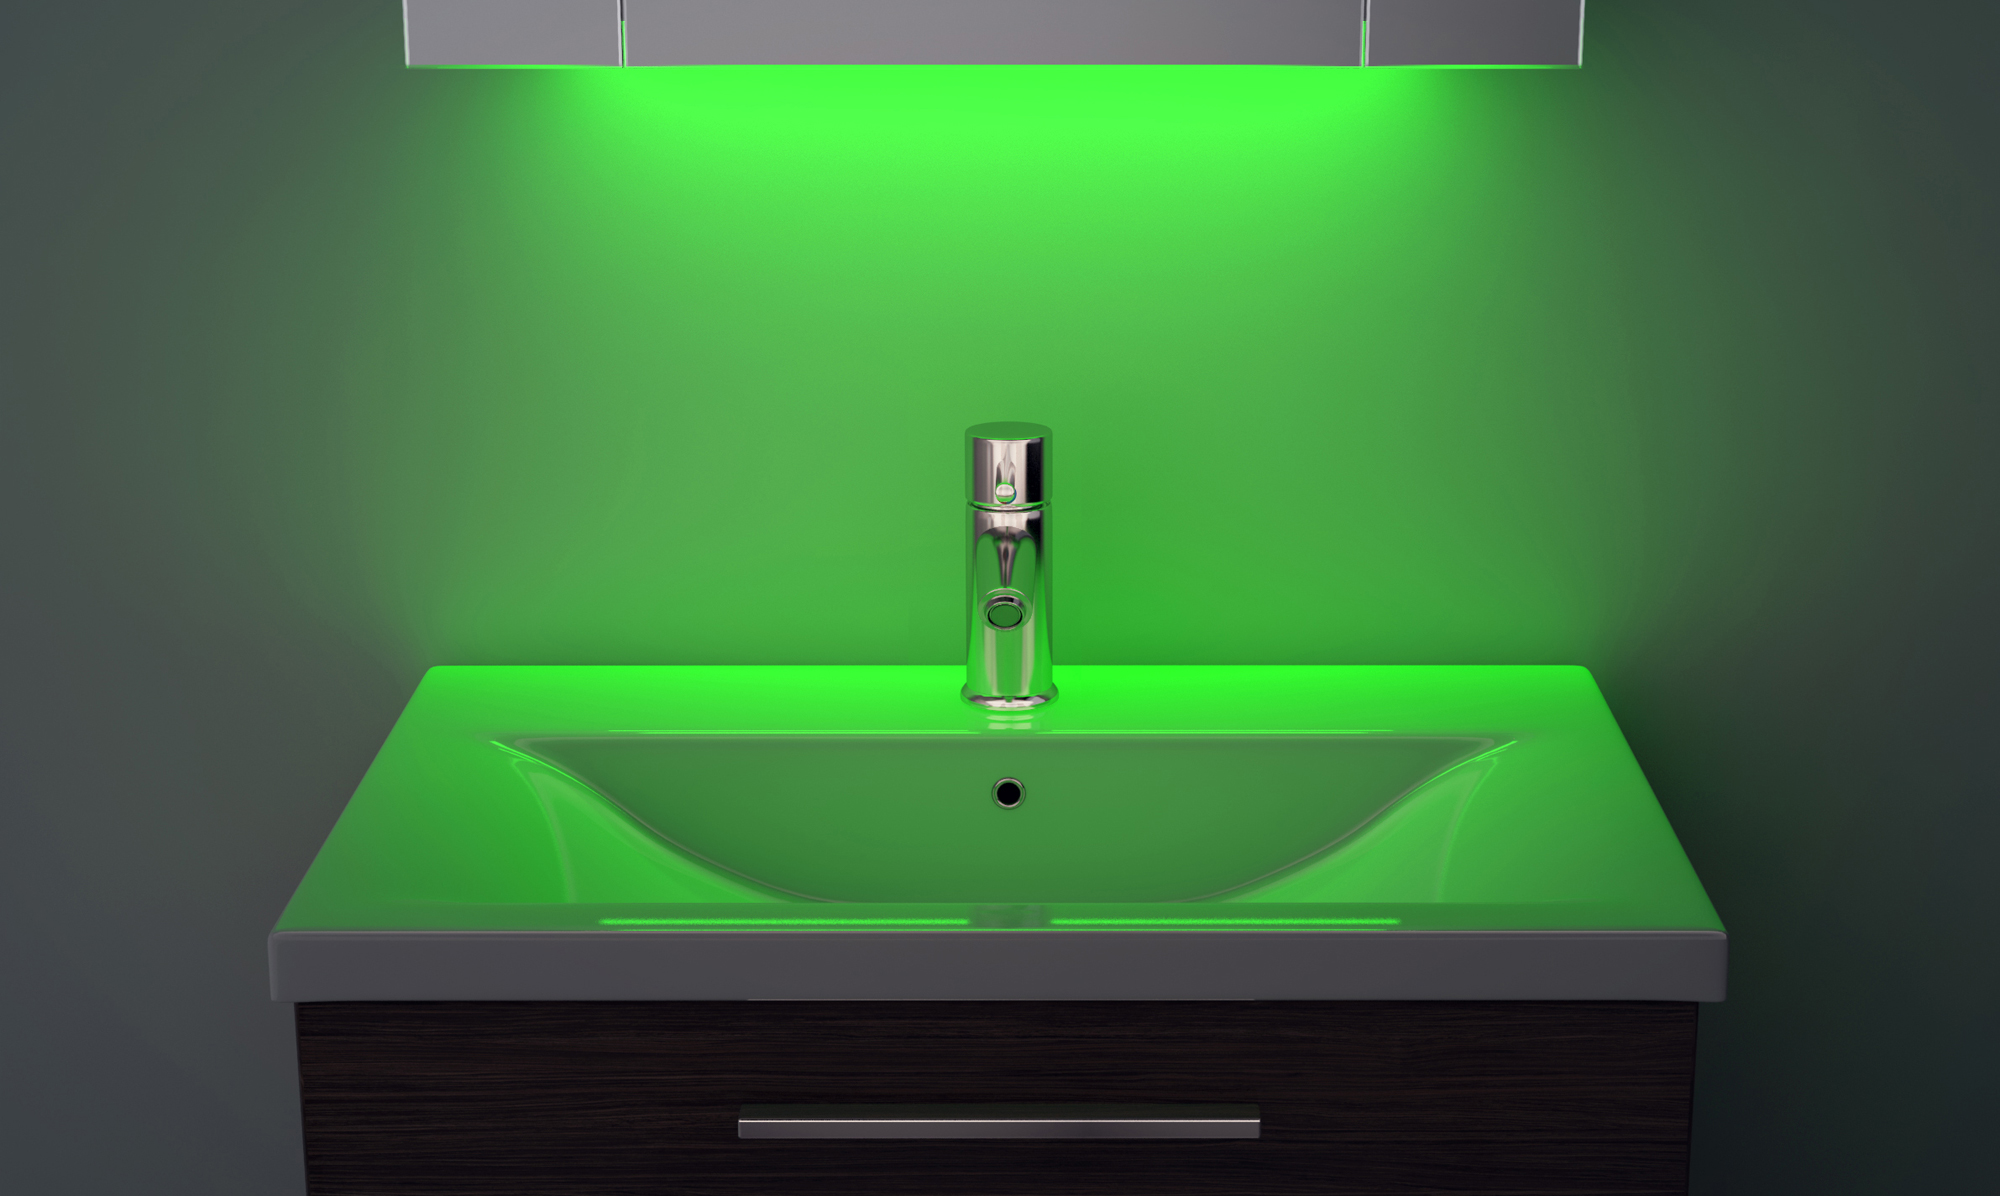 bluetooth schrank mit beleuchtung uhr entfeuchter. Black Bedroom Furniture Sets. Home Design Ideas